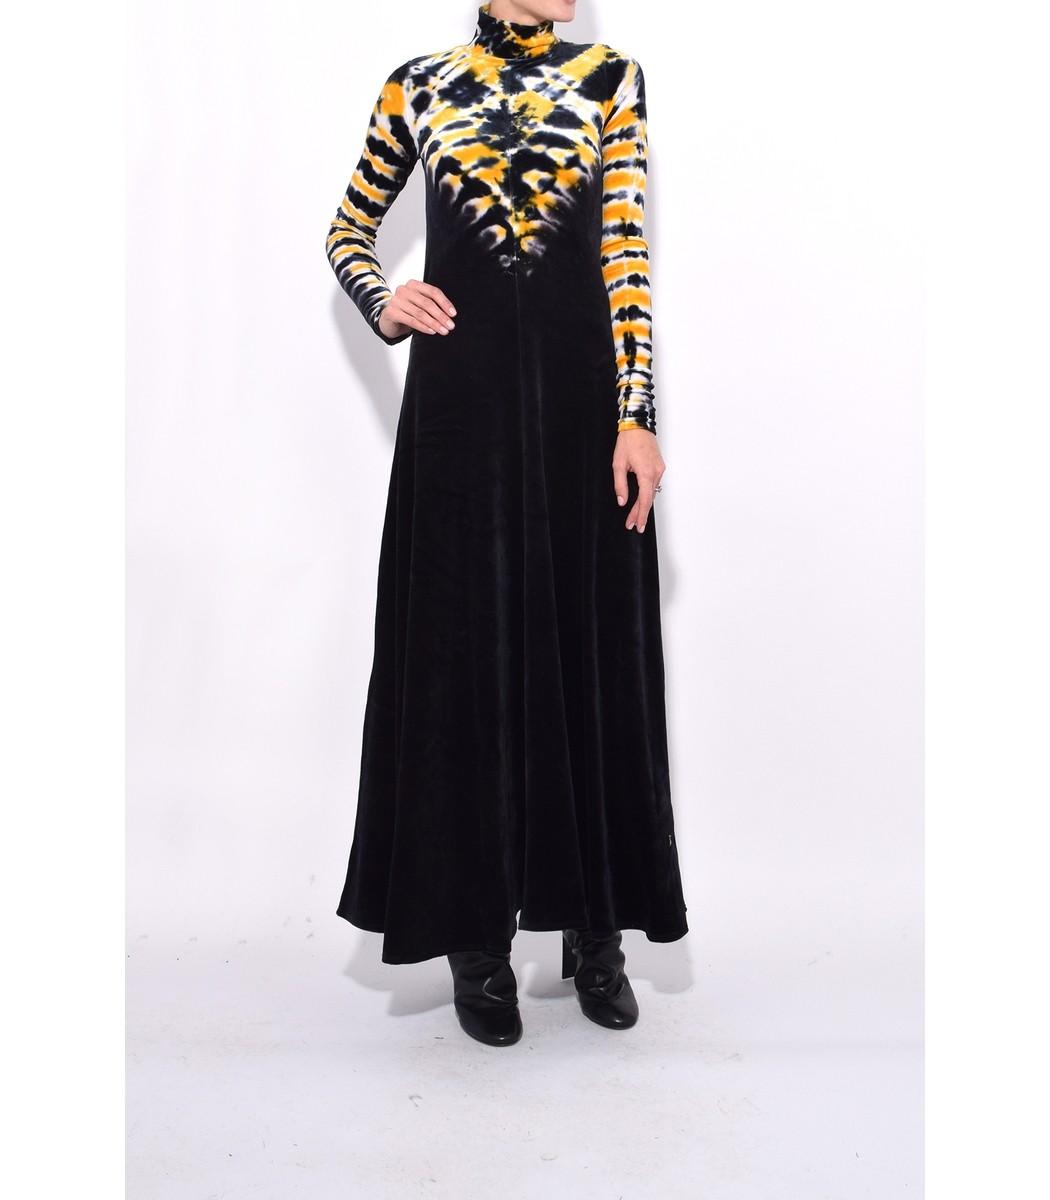 Proenza Schouler Long Sleeve Turtleneck Dress - Yellow/Black Viscose ...